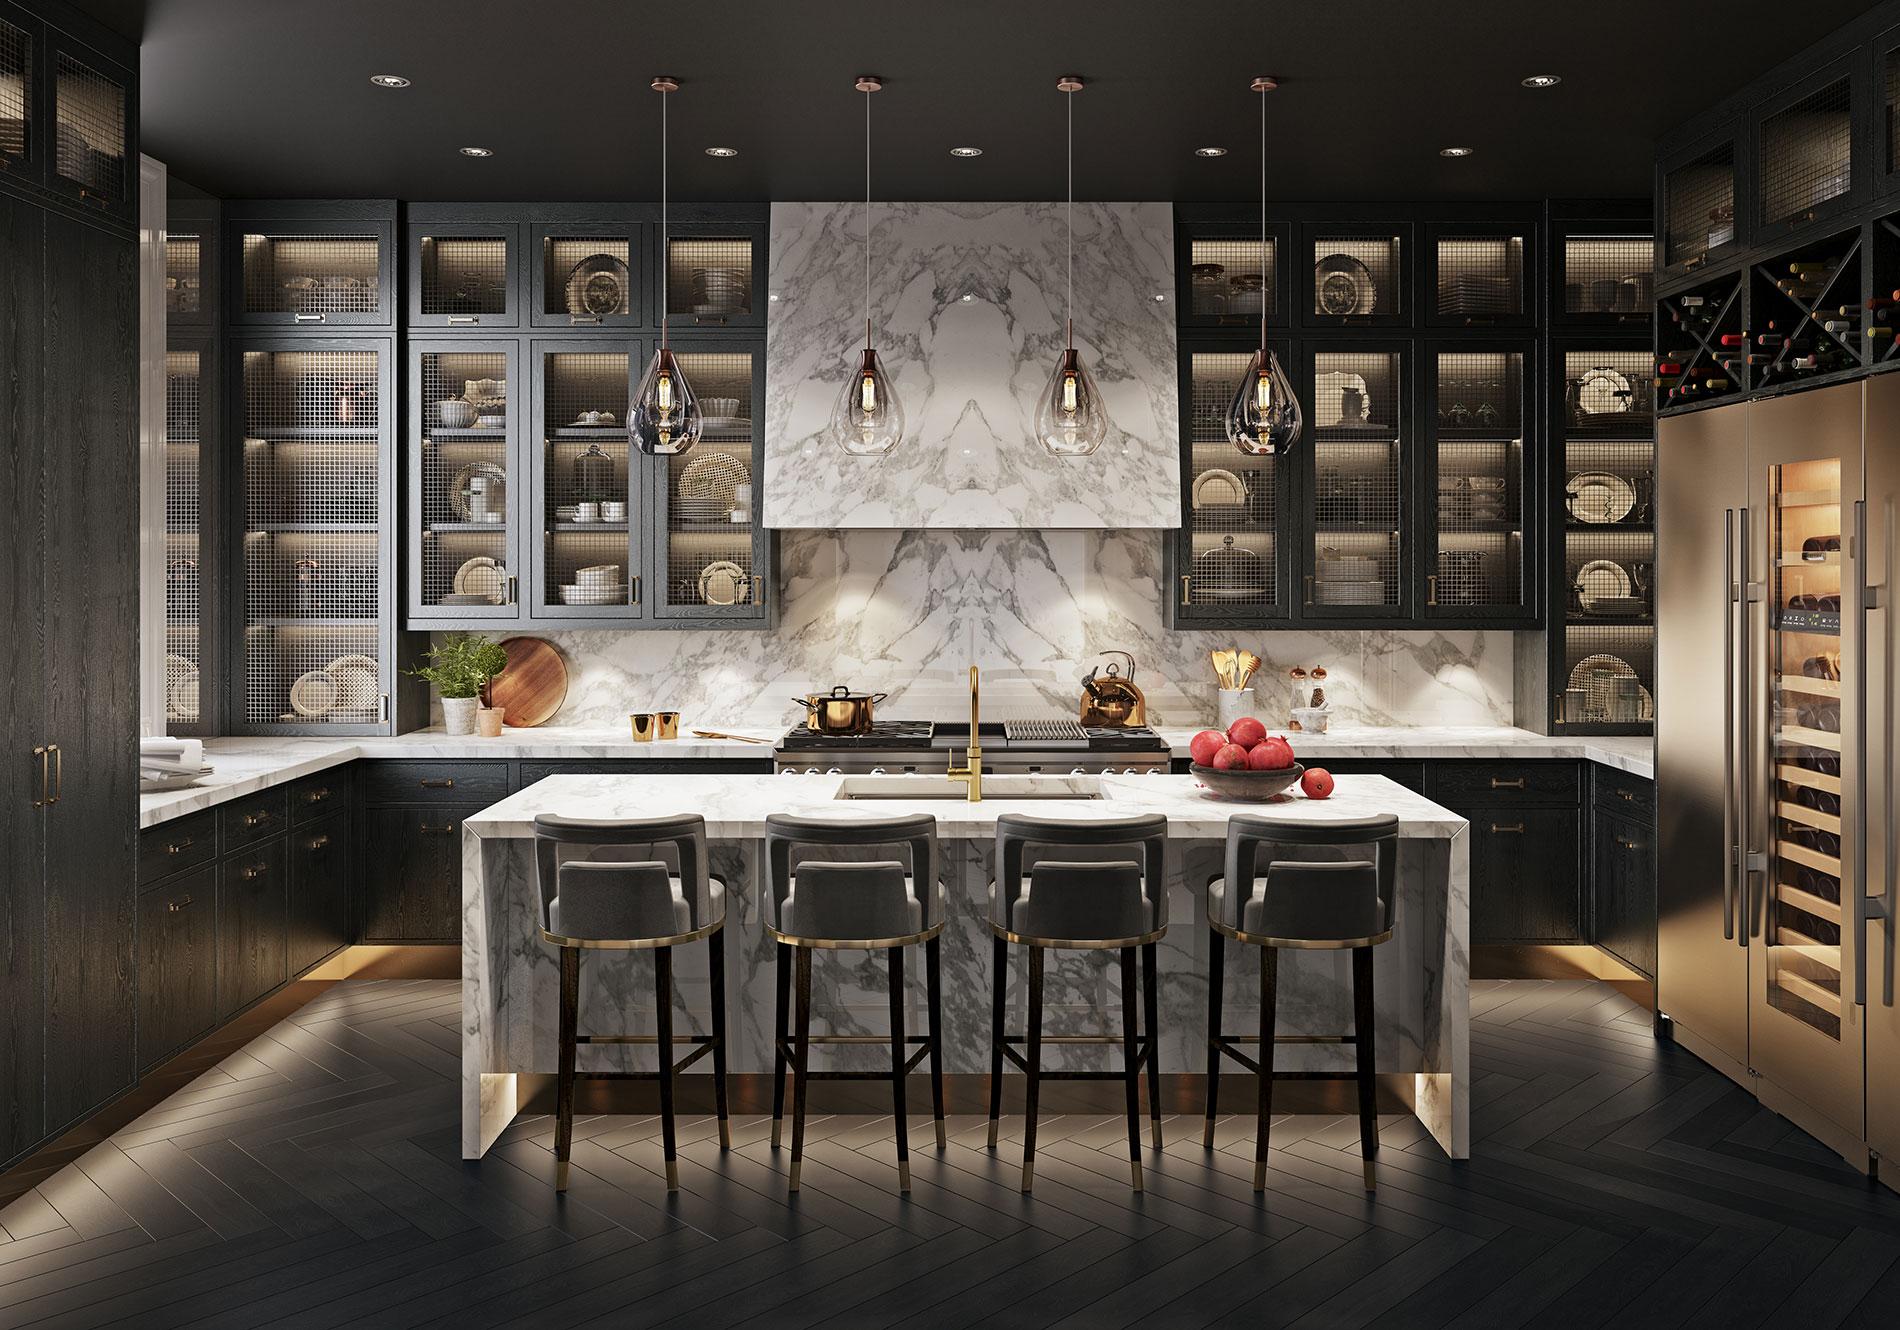 A Smallbone Mulberry kitchen